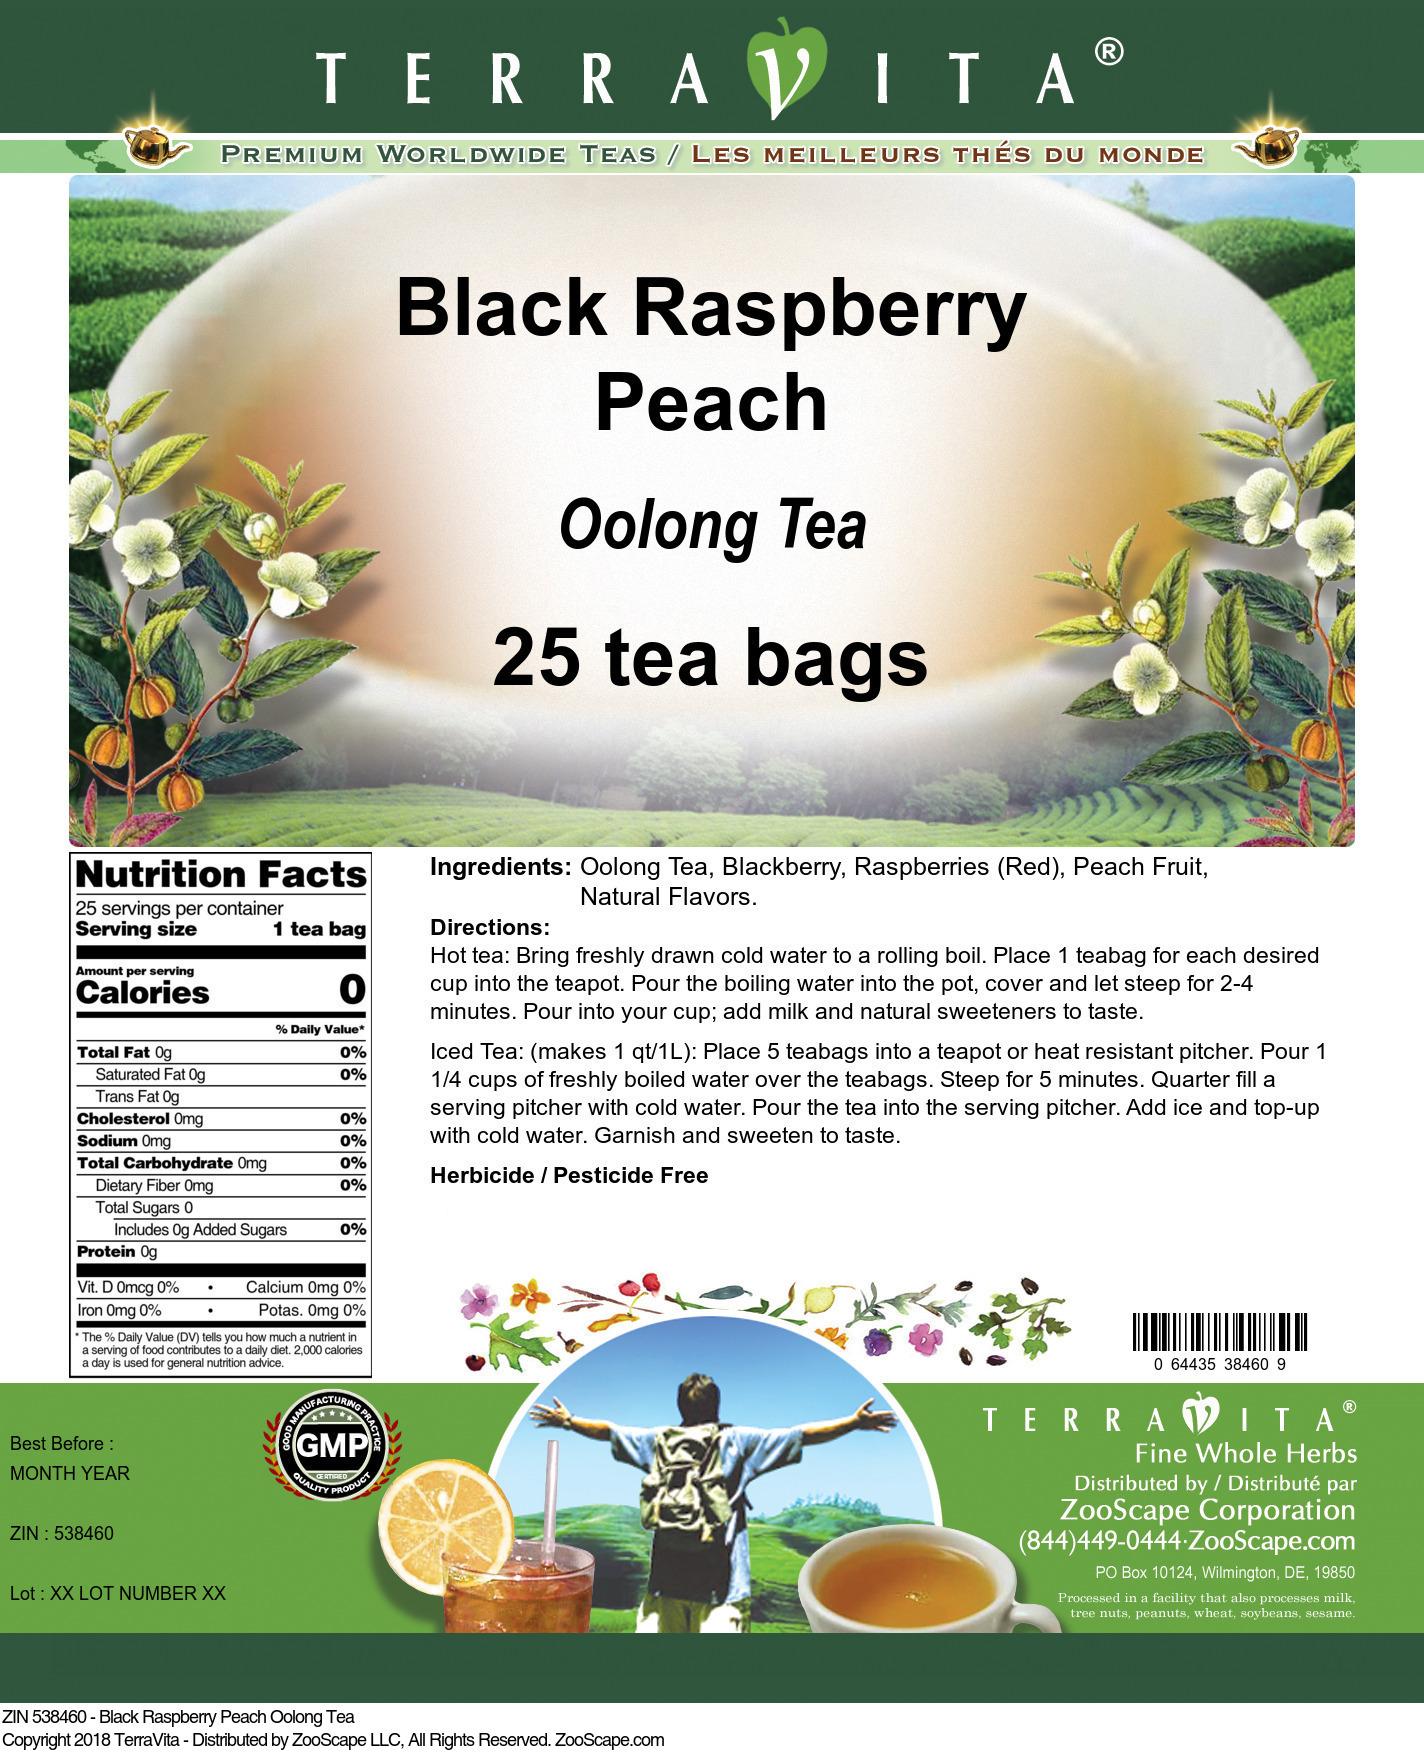 Black Raspberry Peach Oolong Tea